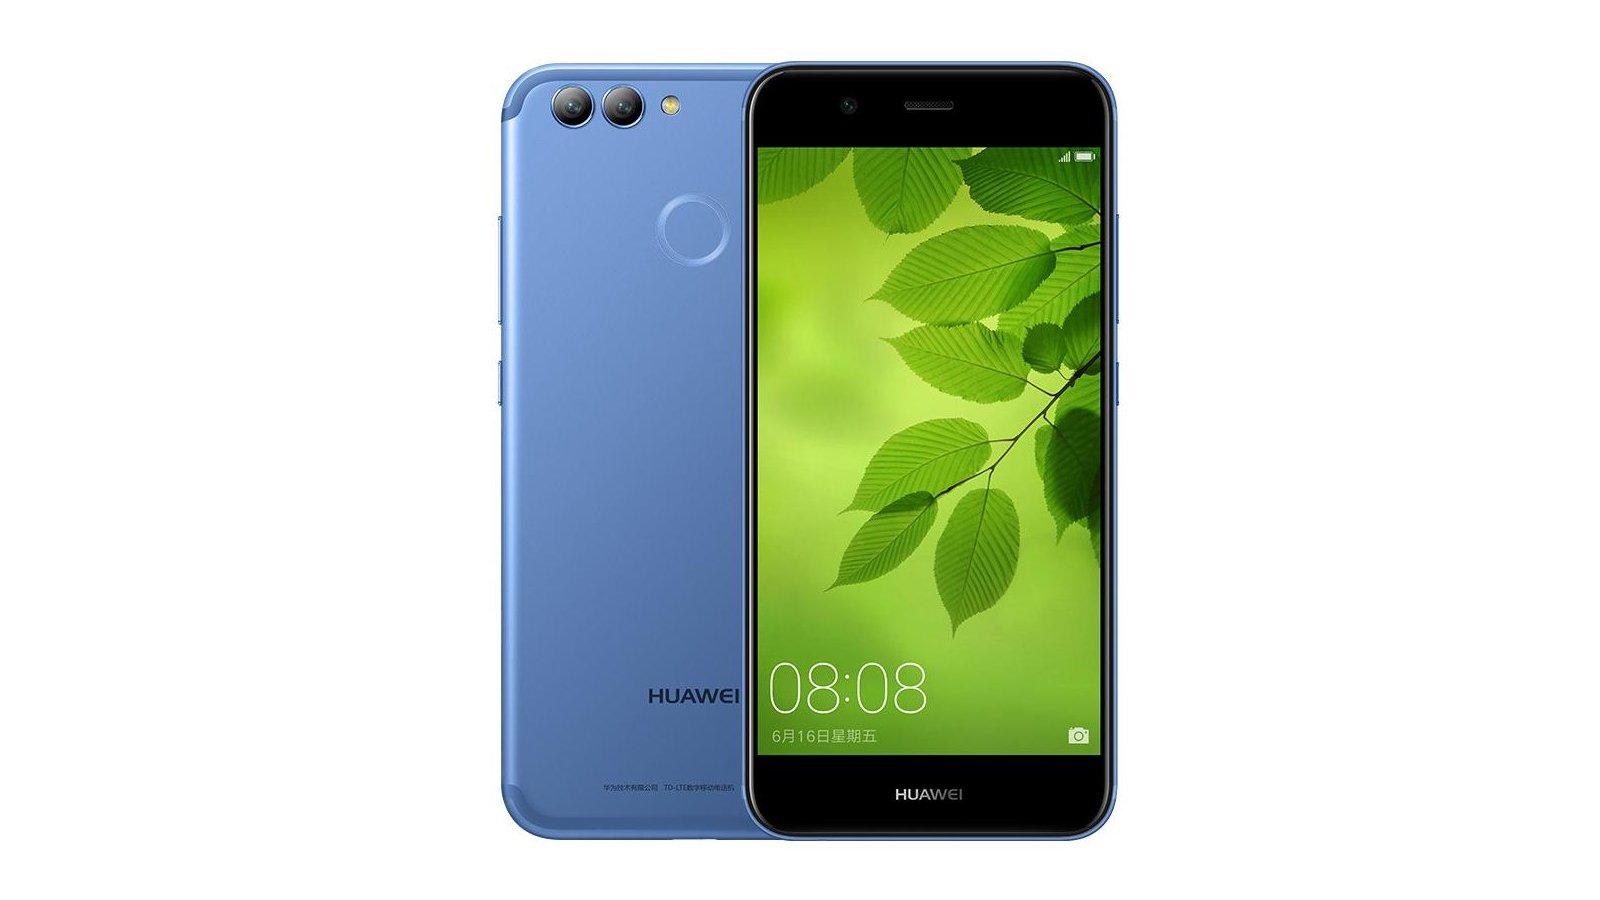 Huawei inizia a reclutare beta tester per Android Oreo per